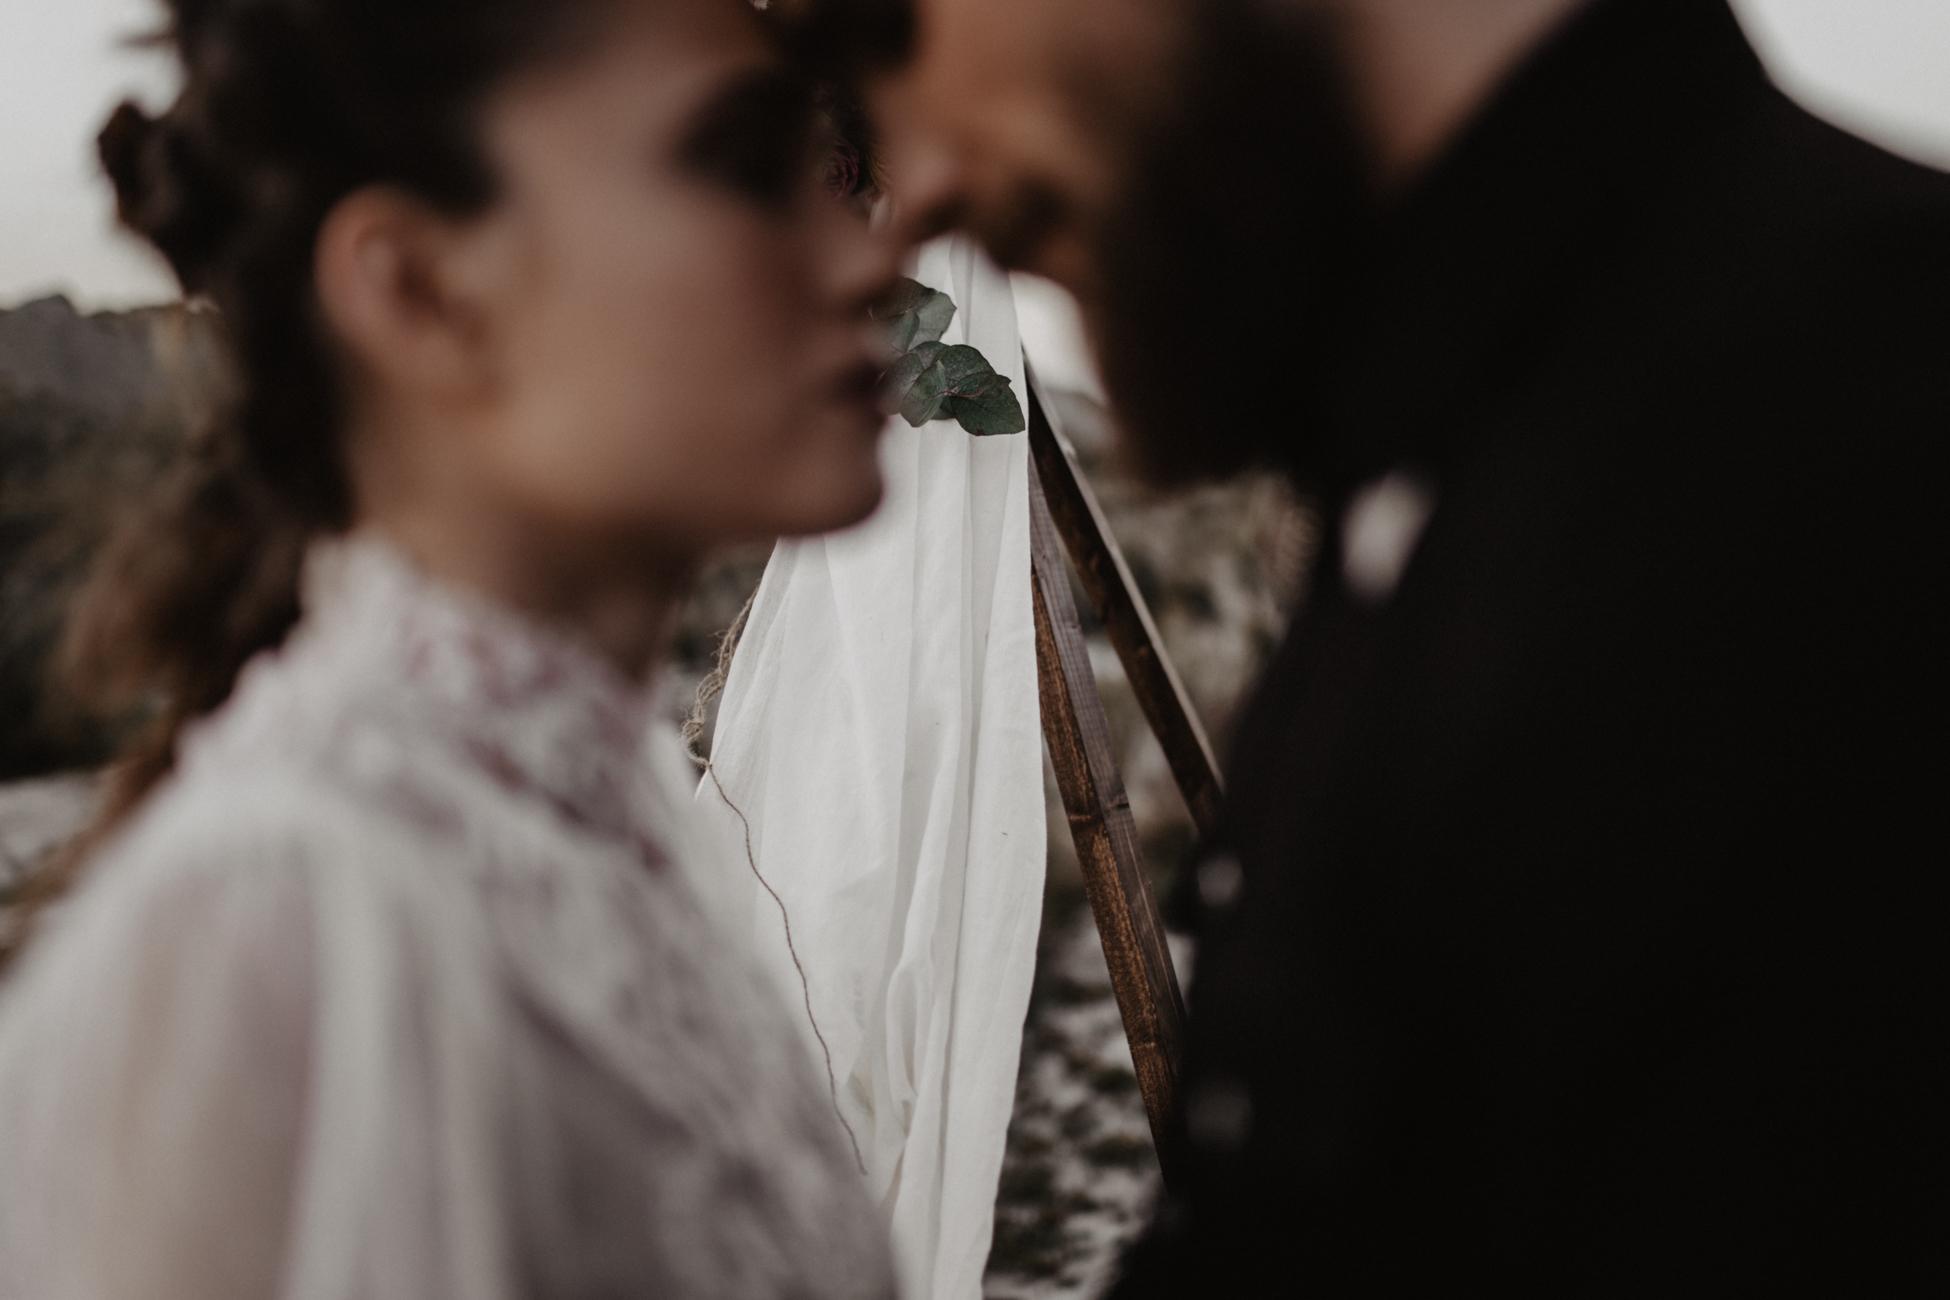 thenortherngirlphotography_photography_thenortherngirl_rebeccascabros_wedding_weddingphotography_weddingphotographer_wood_muebles_deco_bodasdecaramelo_home_bedtime_gaywedding_editorial_desierto_desert_wildestdreams_amortexano-392.jpg